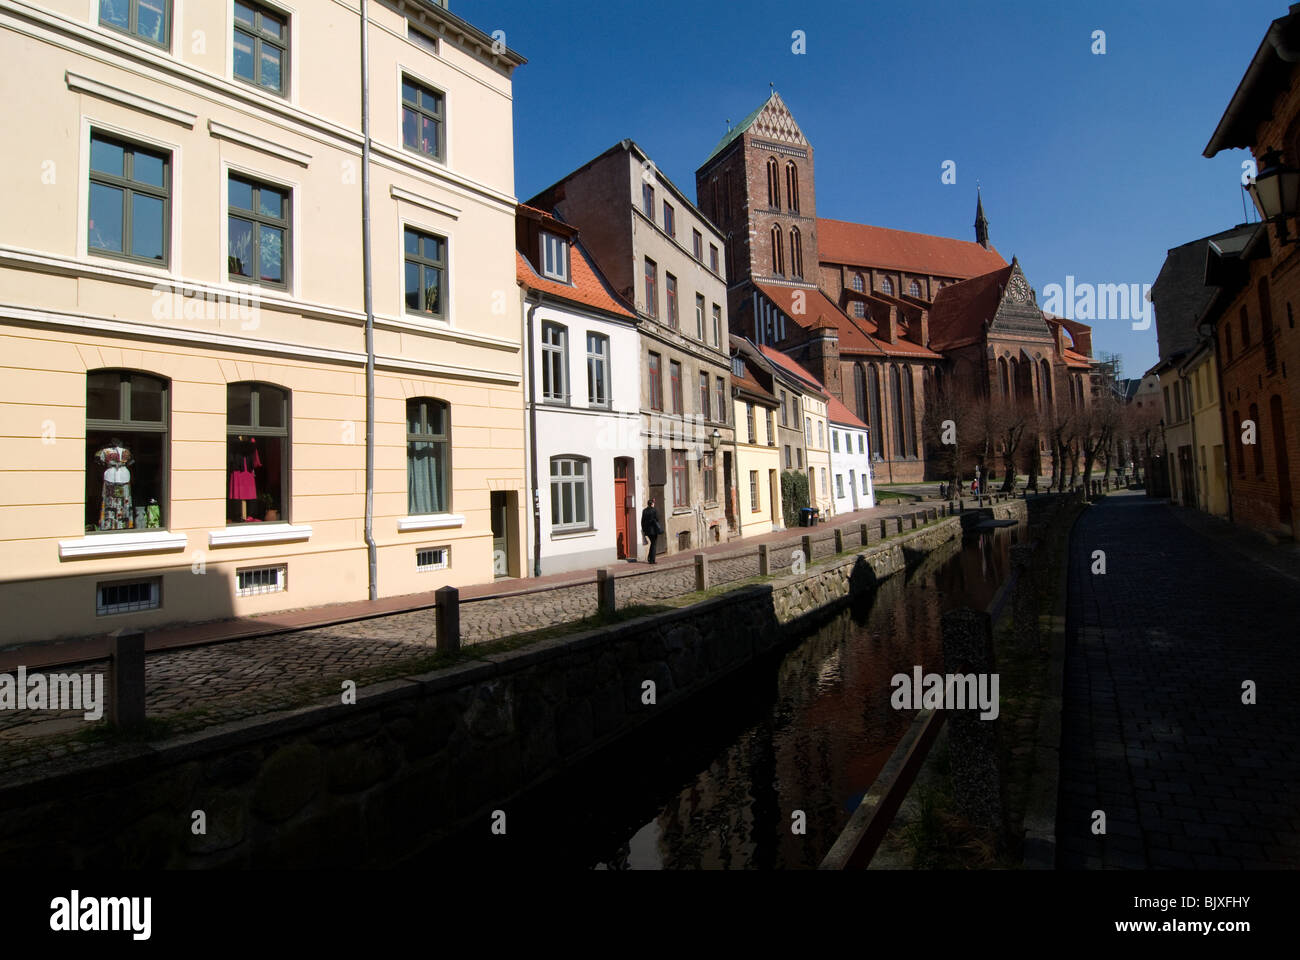 Historic buildings in Wismar, Mecklenburg-Western Pomerania, Germany. - Stock Image